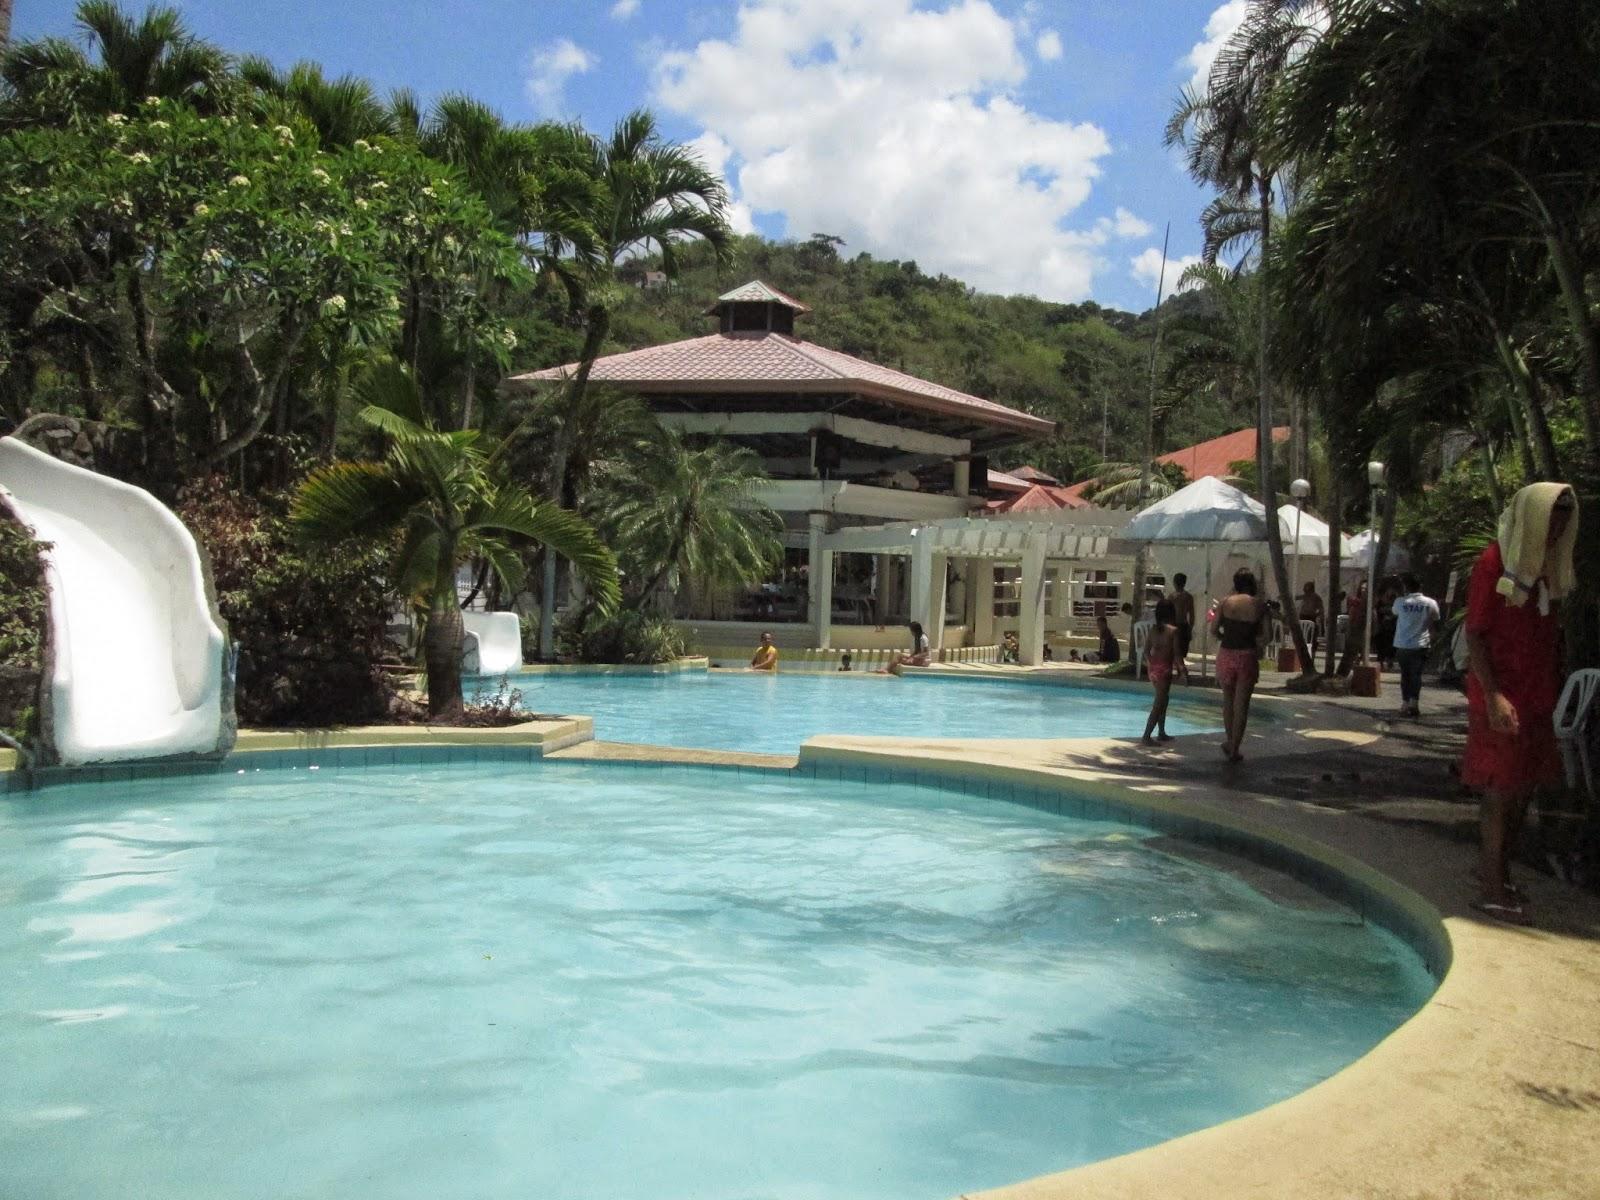 SPLASH MOUNTAIN RESORT LAGUNA #55 - YouTube |Splash Mountain Laguna Hotel